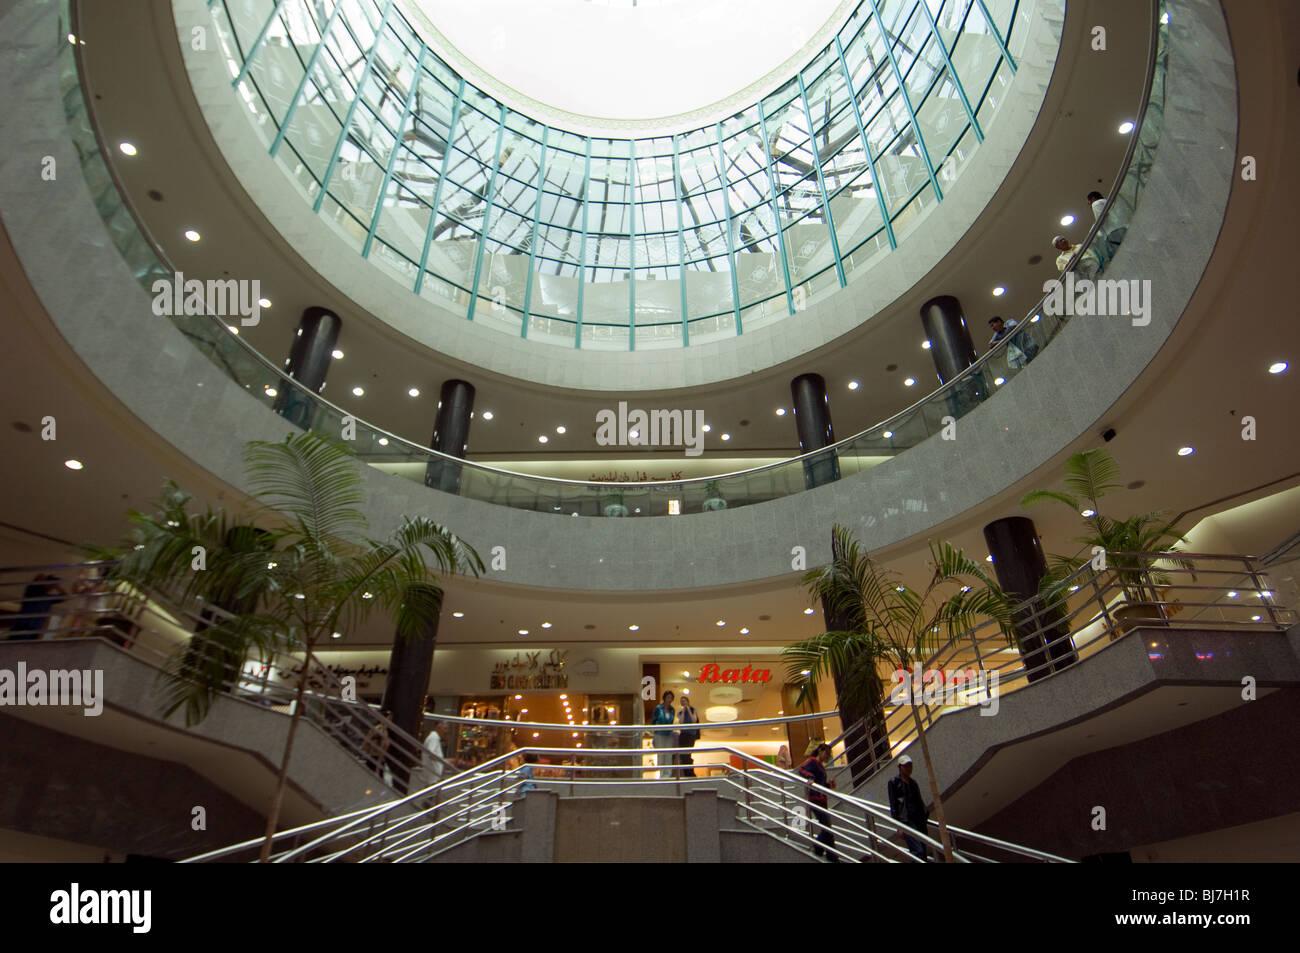 Shopping Centre, Bandar Seri Begawan, Brunei Darussalam Immagini Stock